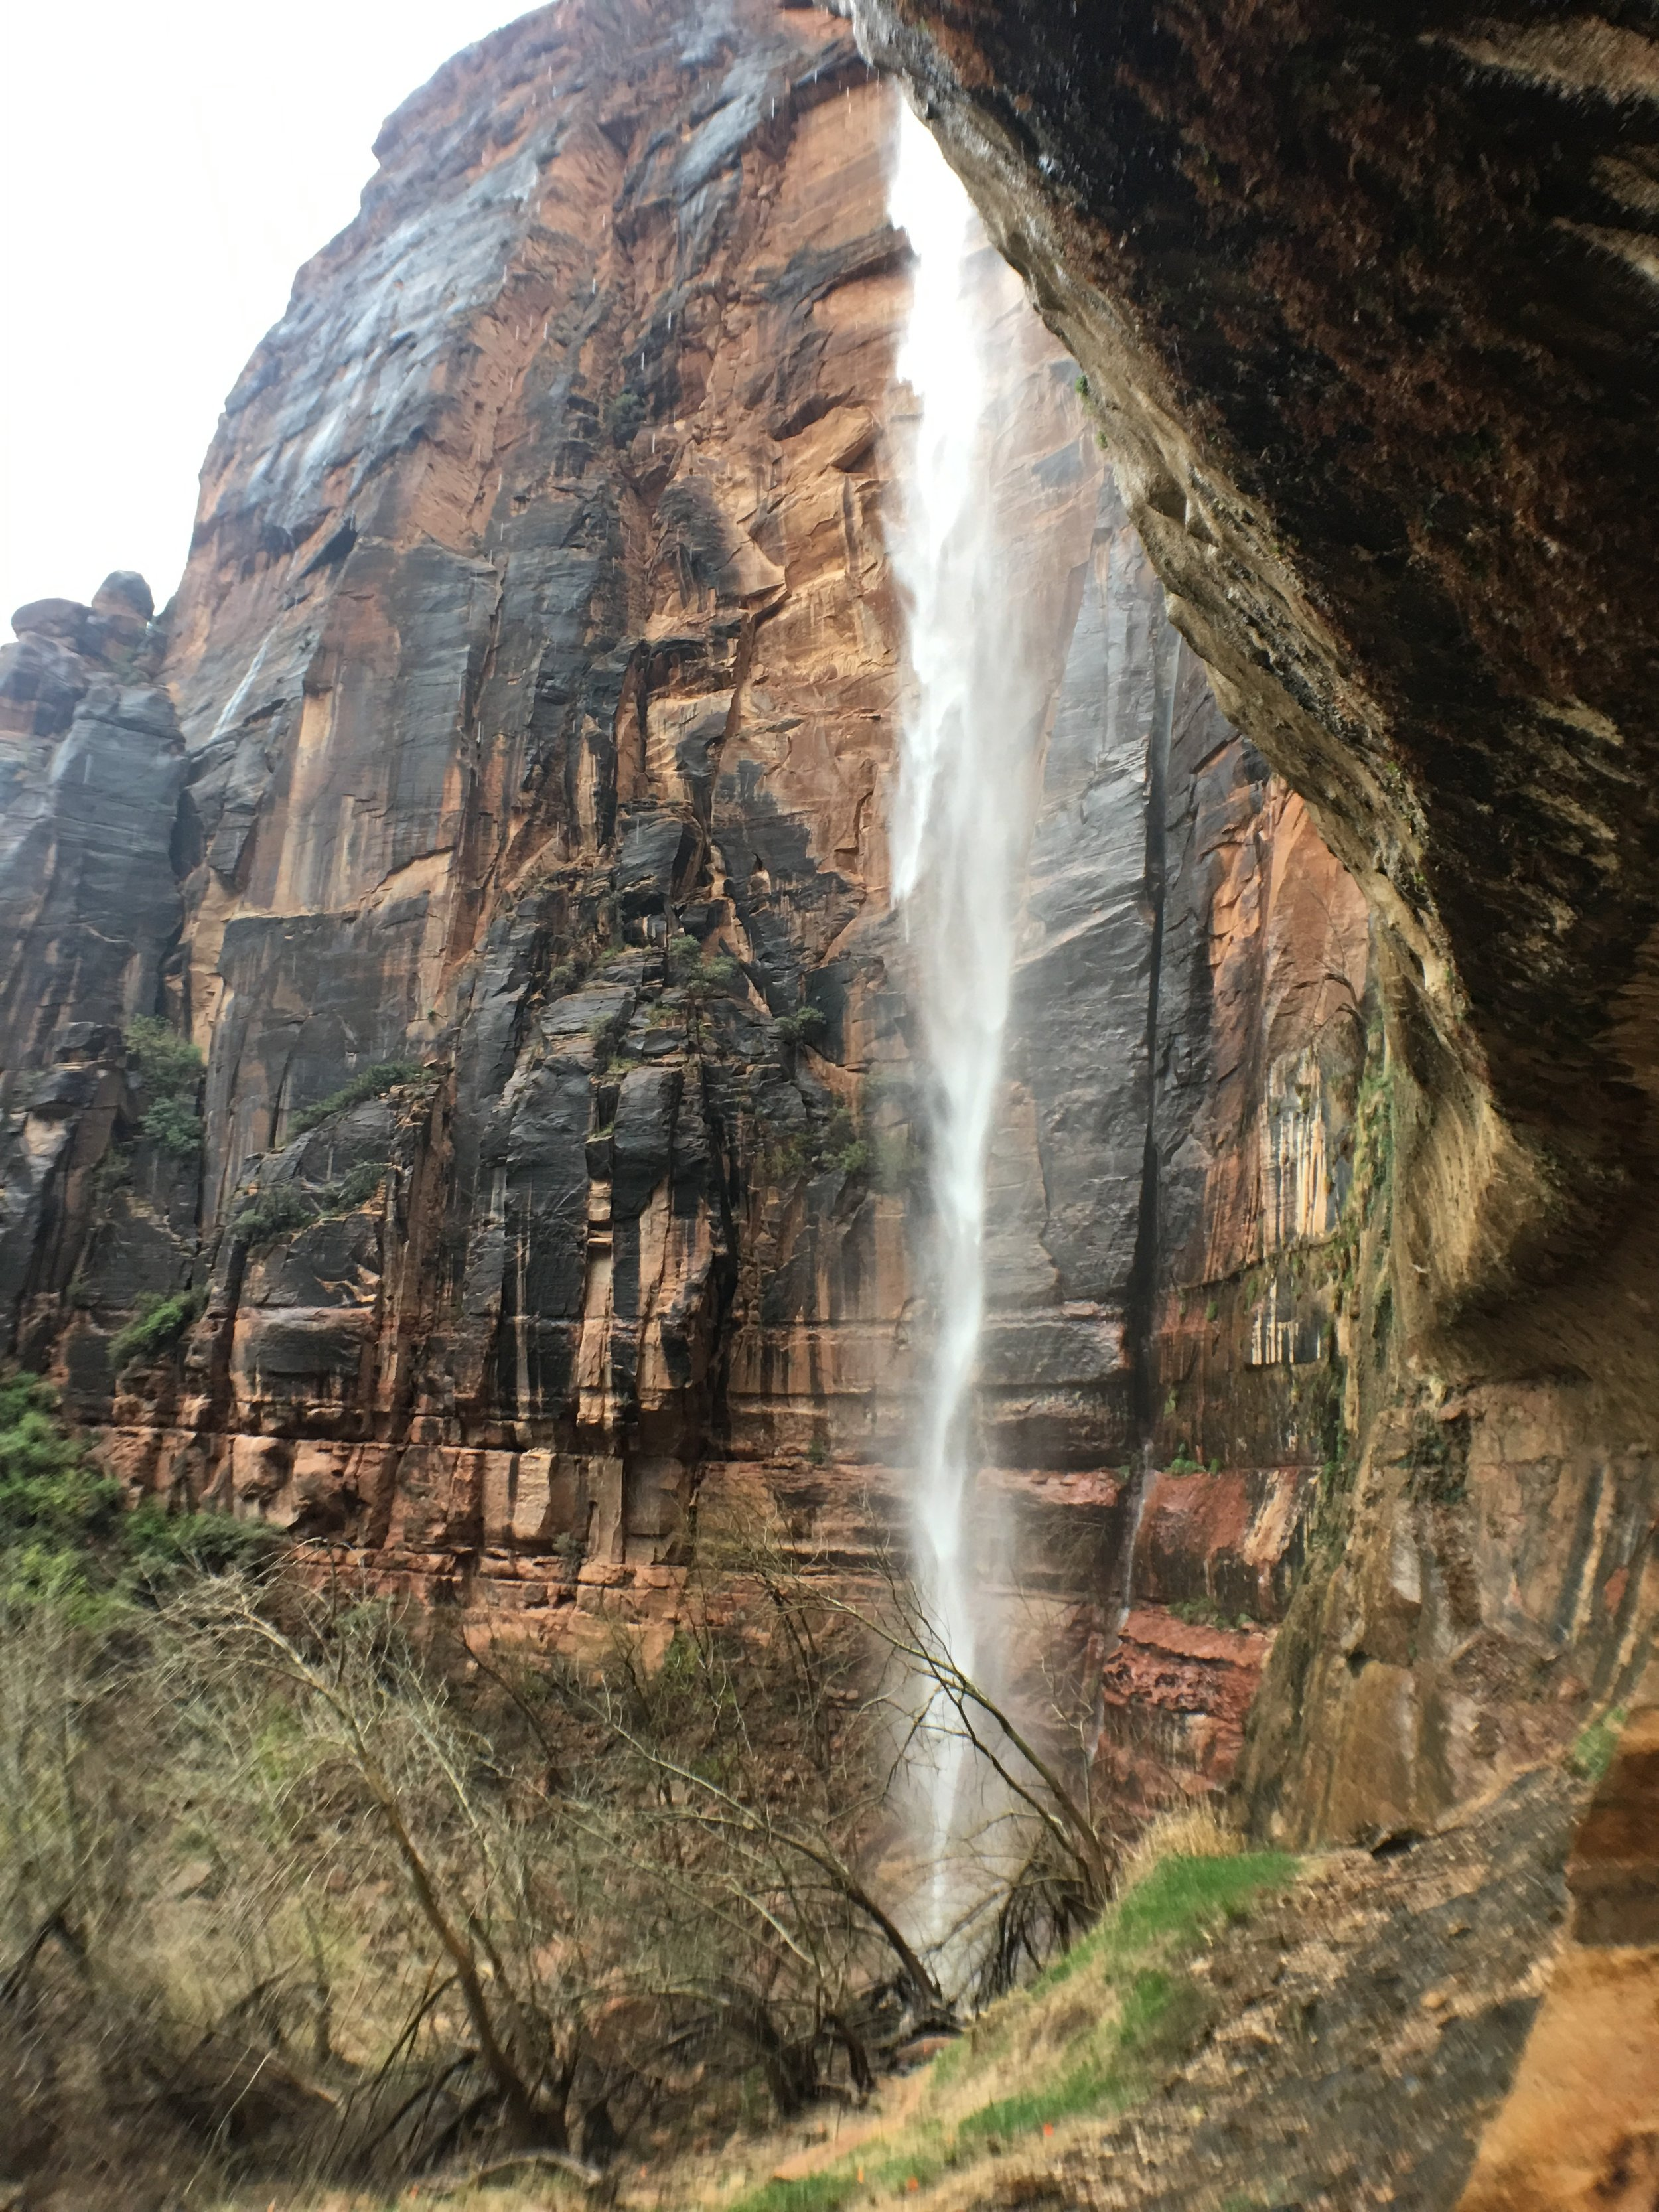 The Weeping Rocks